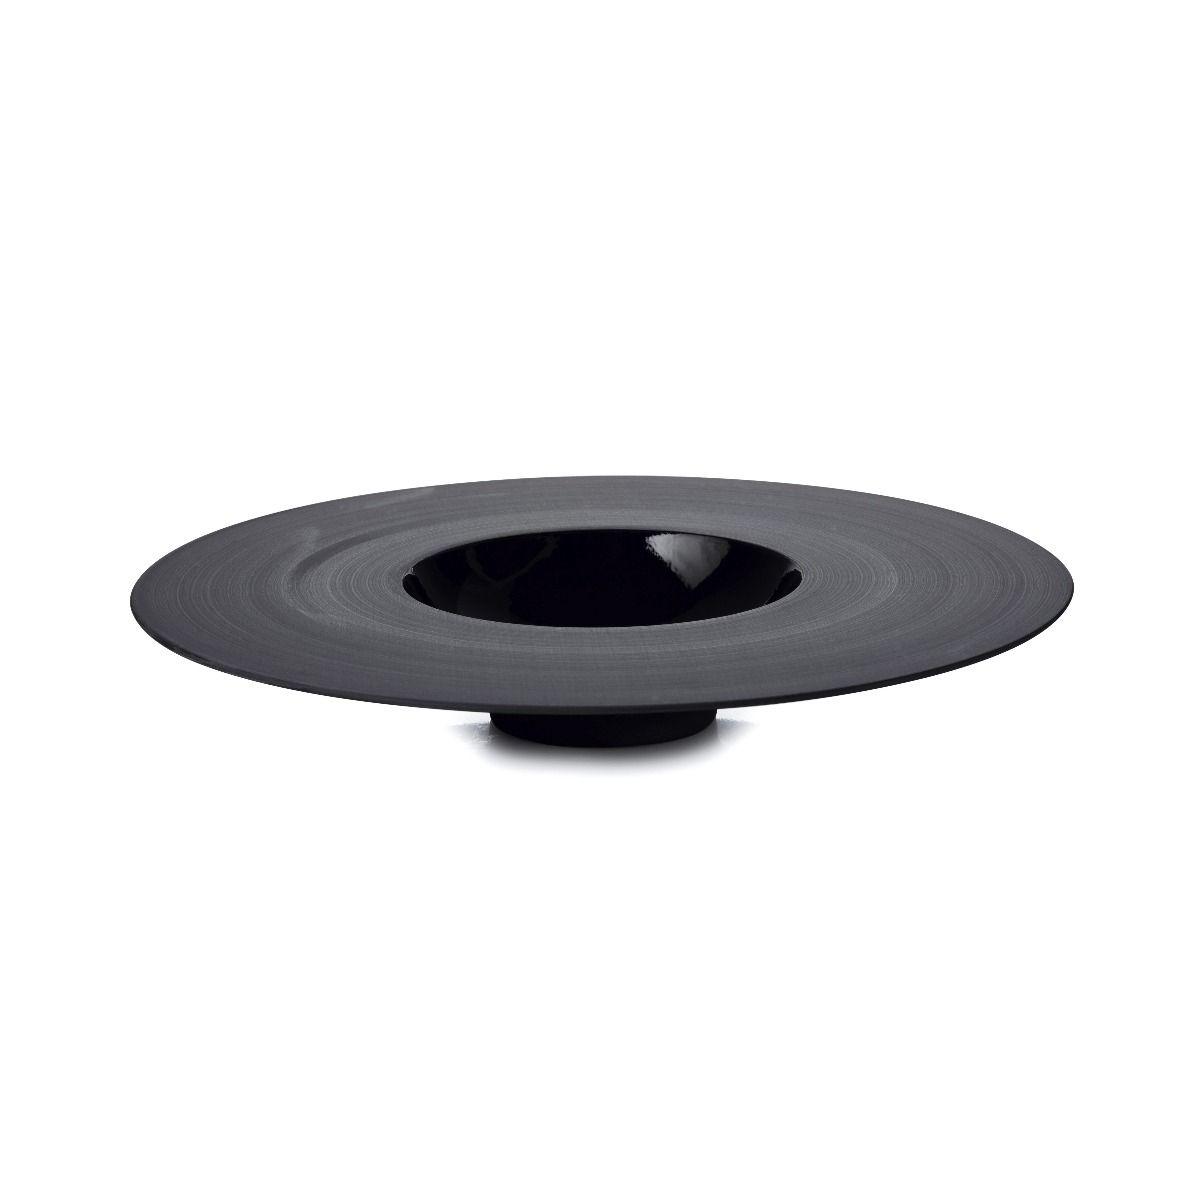 Talerz 30,3 cm Sphere Revol czarny